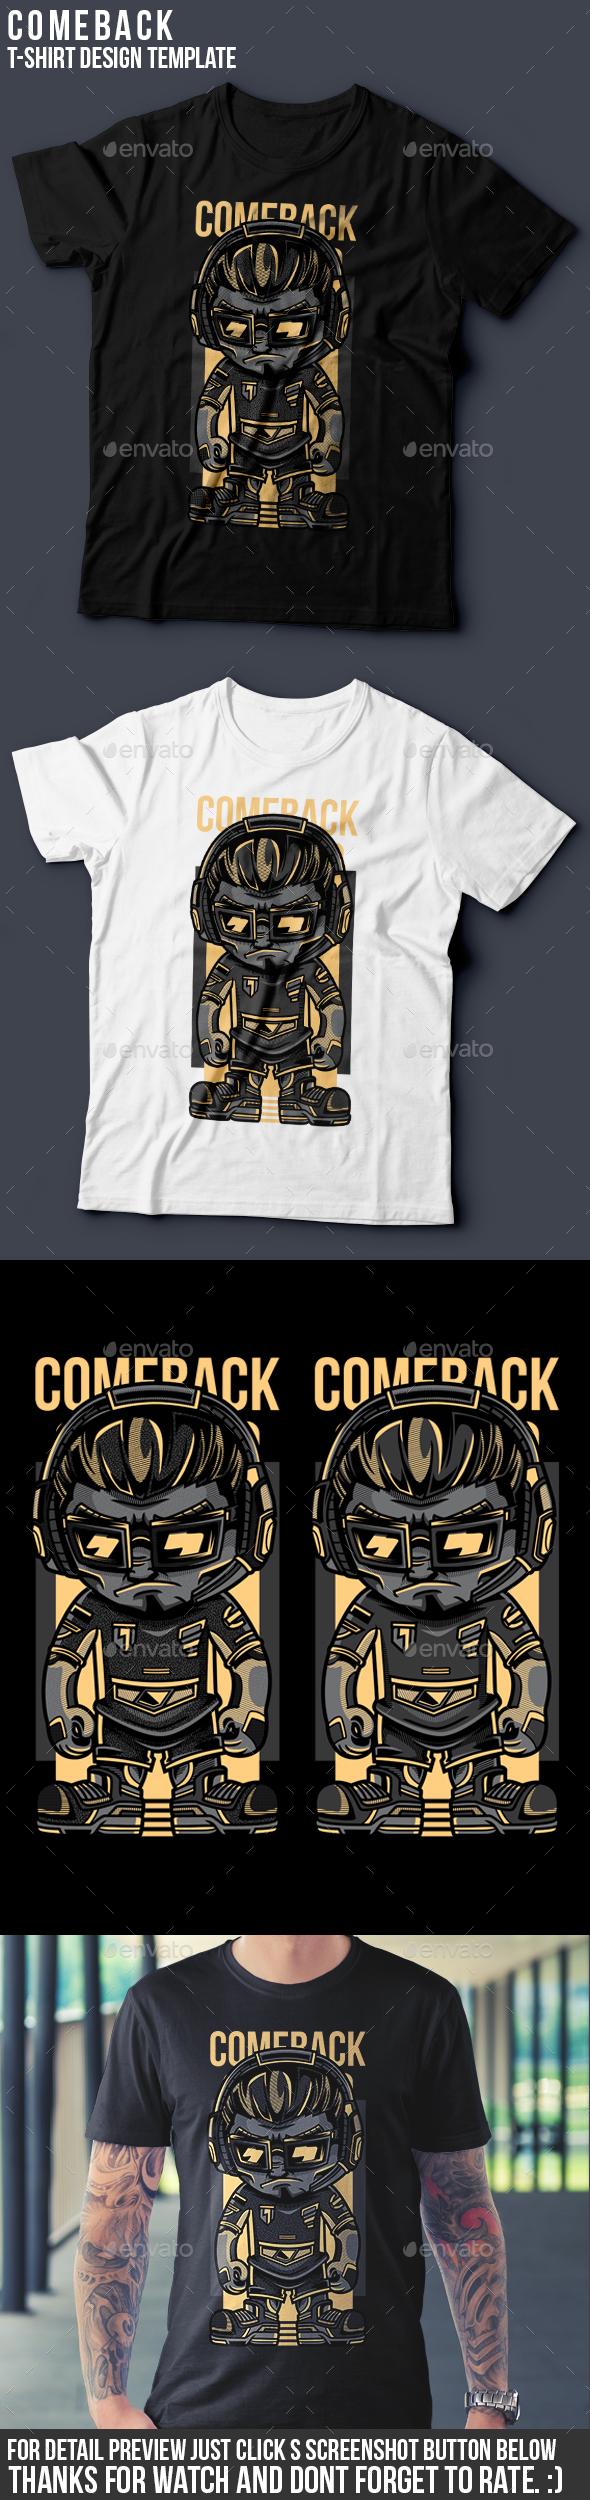 Comeback T-Shirt Design - Sports & Teams T-Shirts